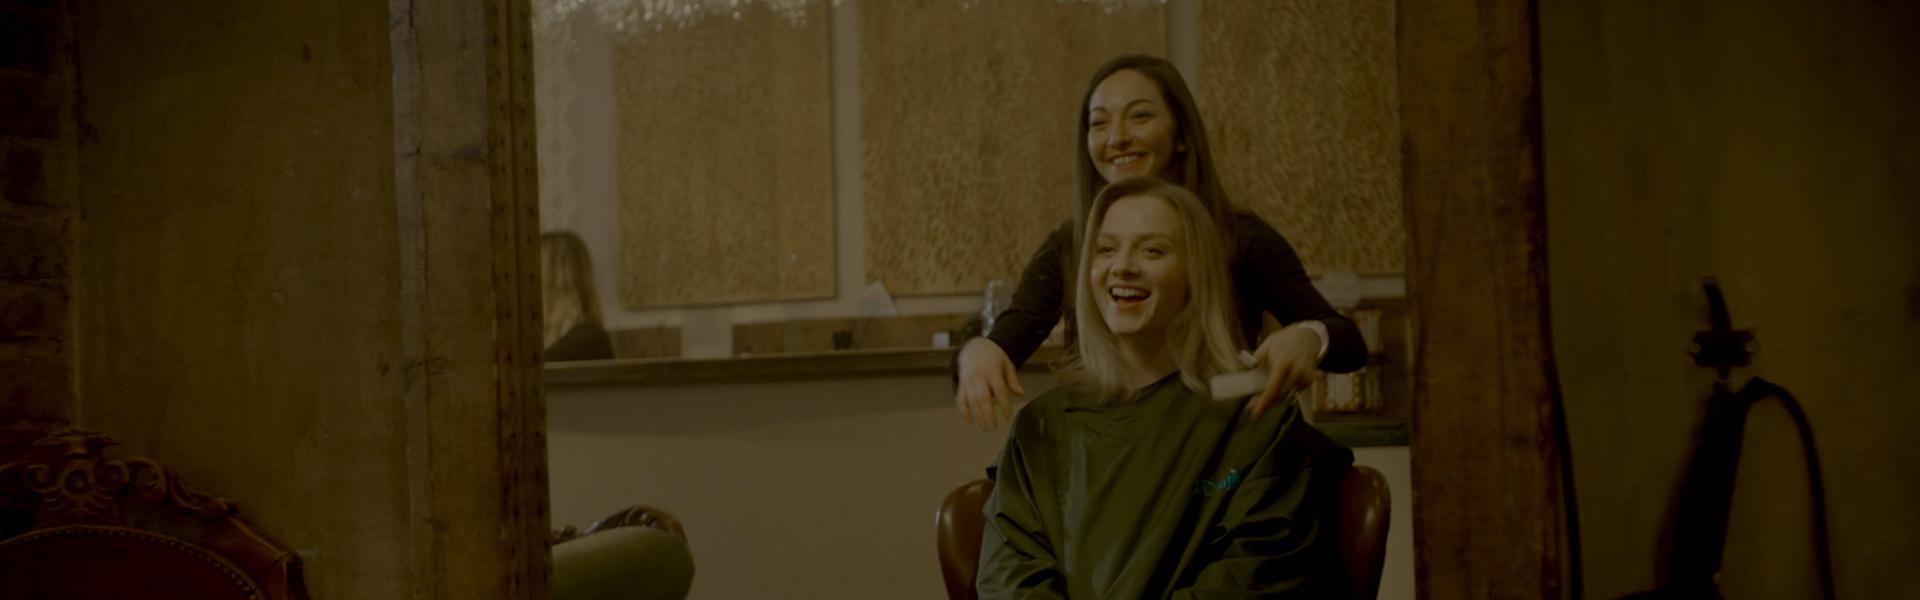 Due donne in un salone di parrucchiere